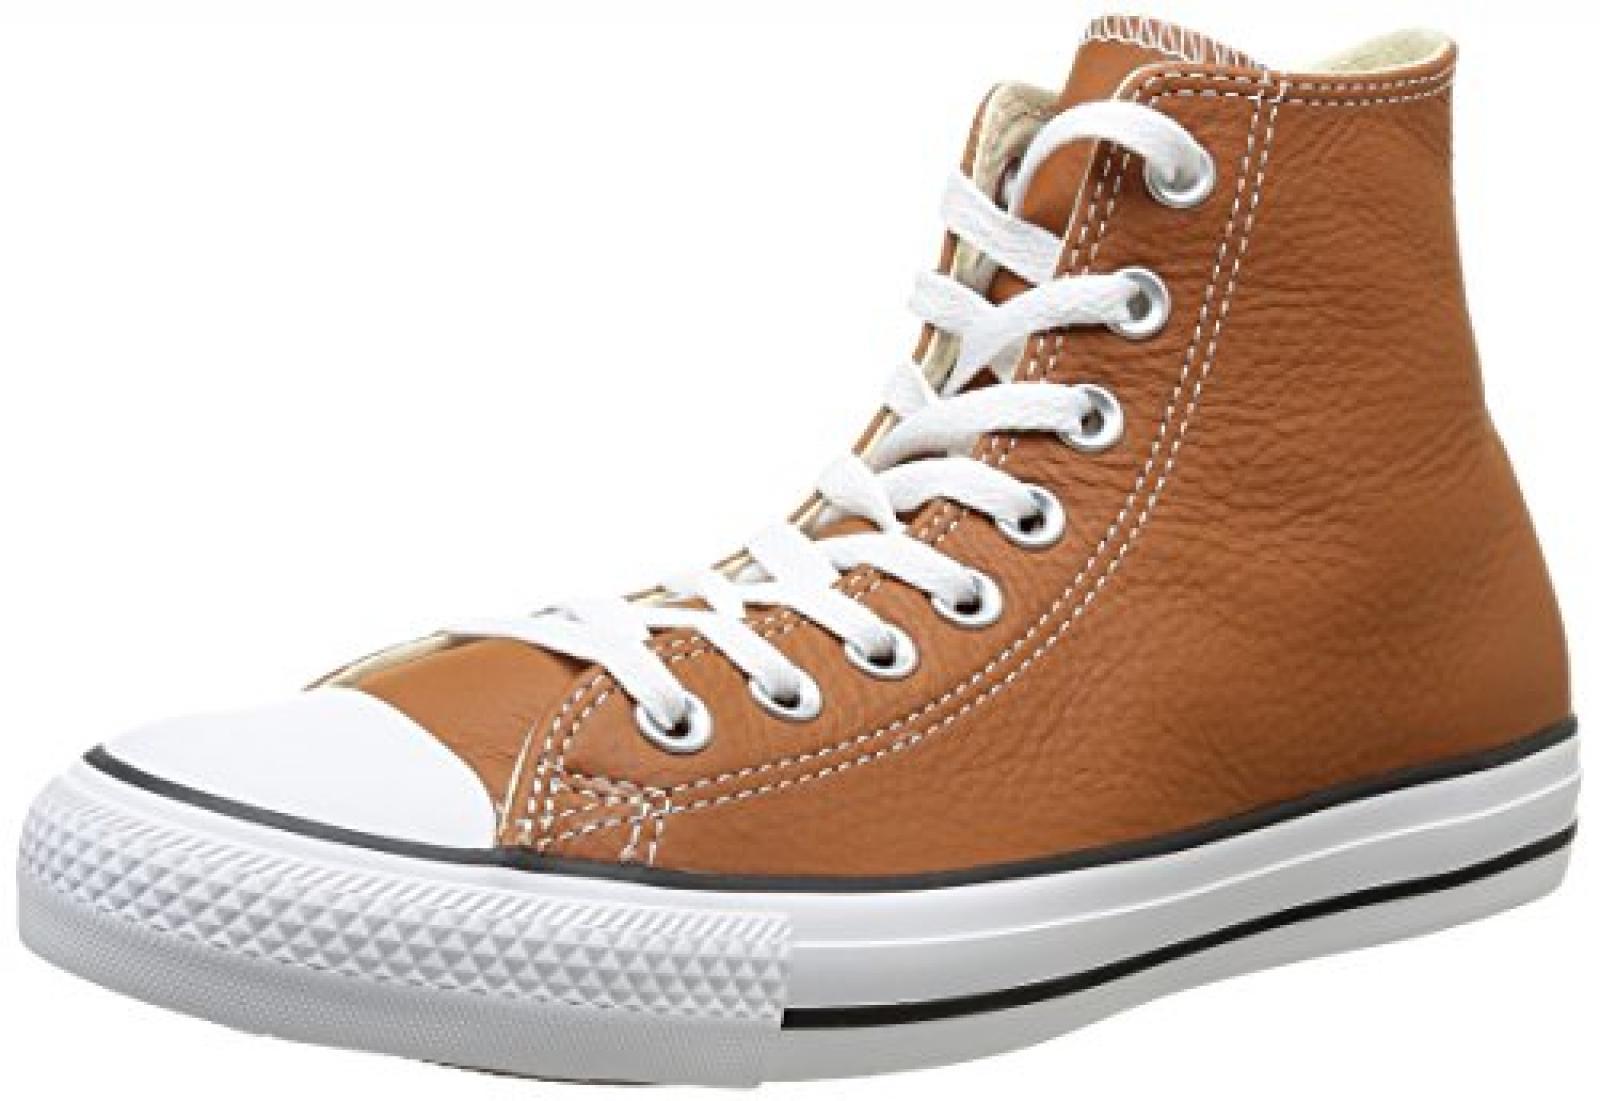 Converse Chuck Taylor All Star Adulte Seasonal Leather Hi 380980 Unisex - Erwachsene Sneaker